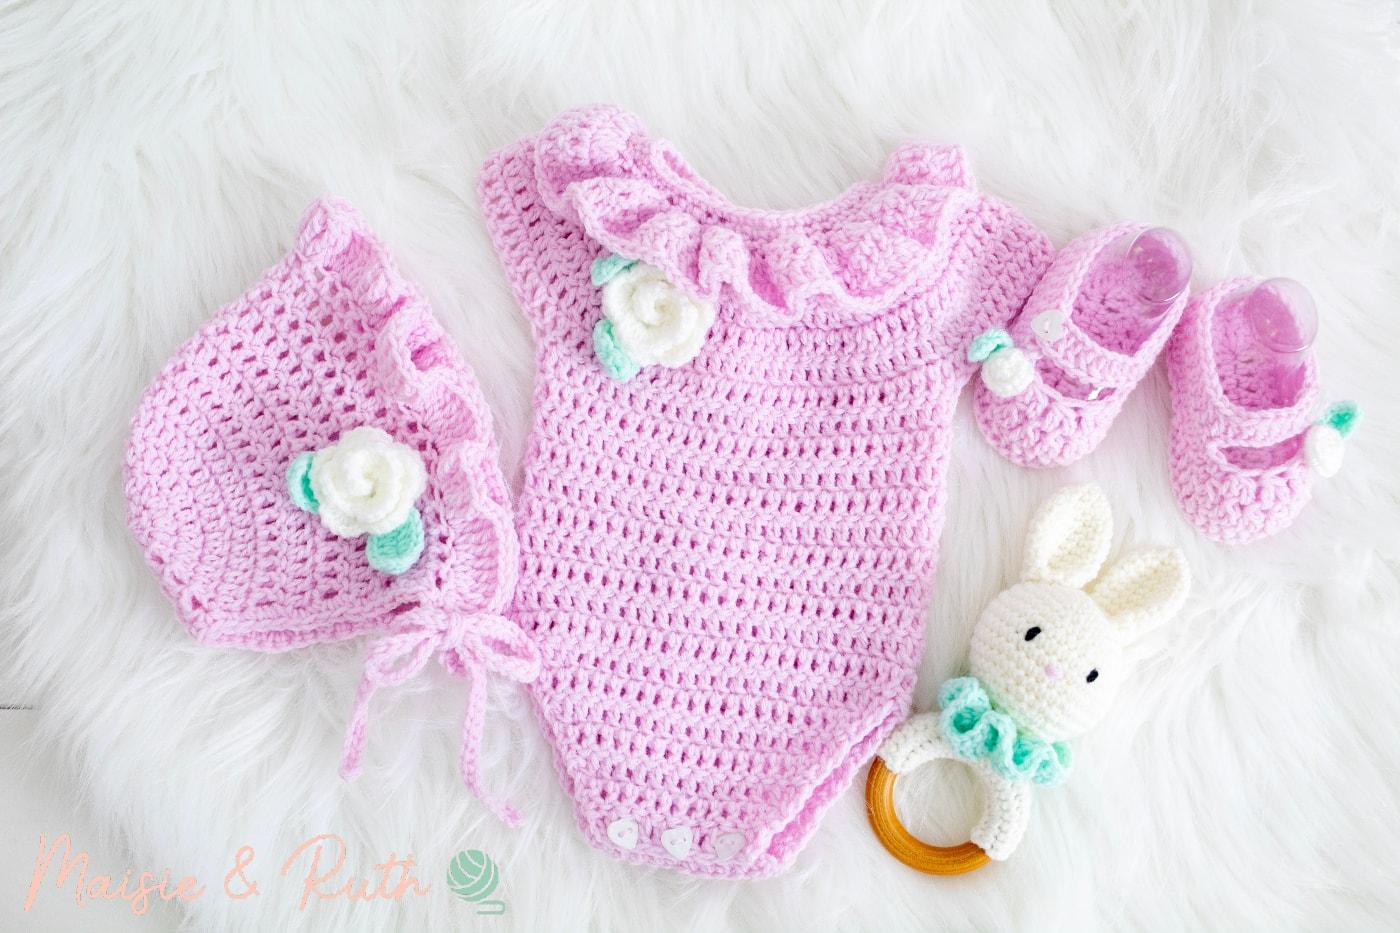 Crochet Baby Hat Pattern Baby Set Items